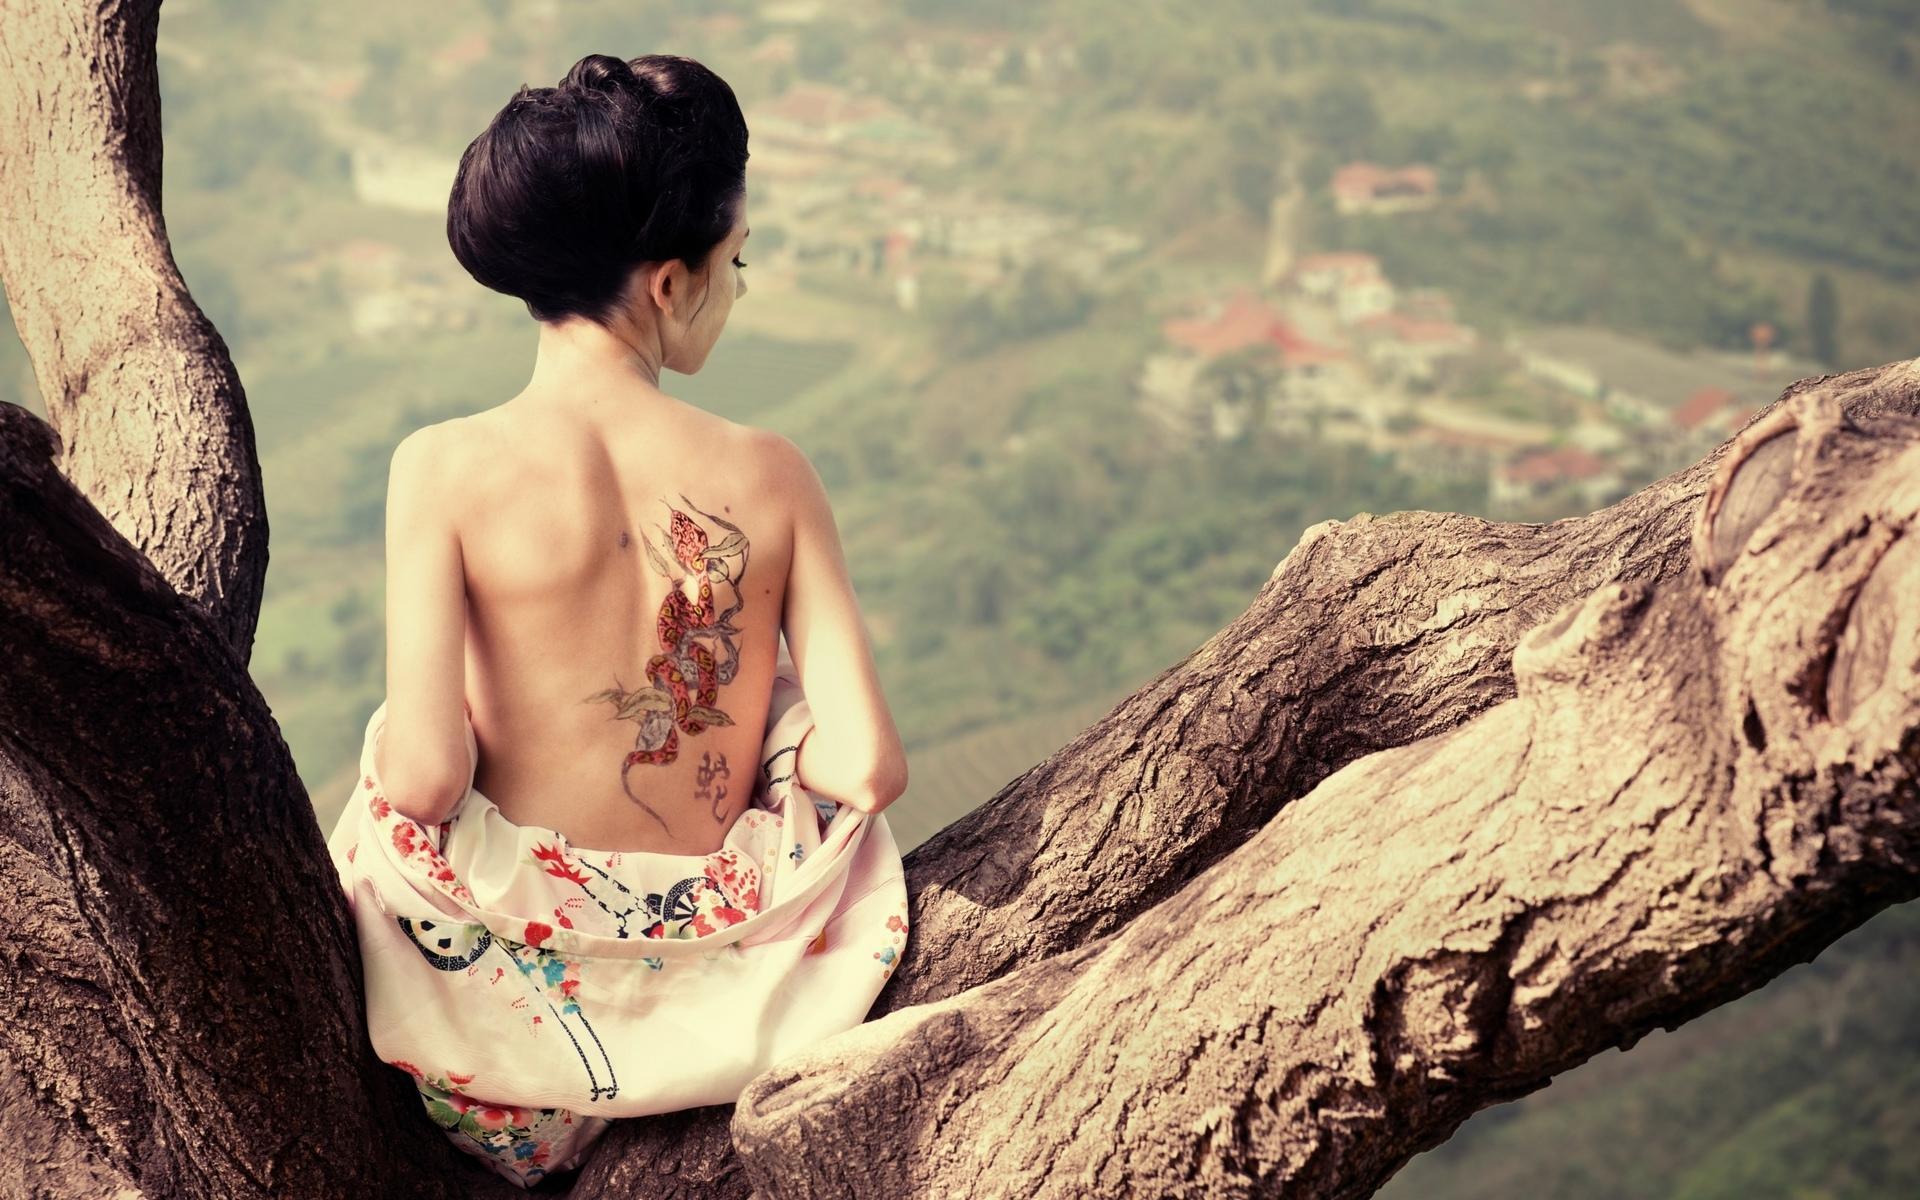 девушка, гейша, с тату, на дереве